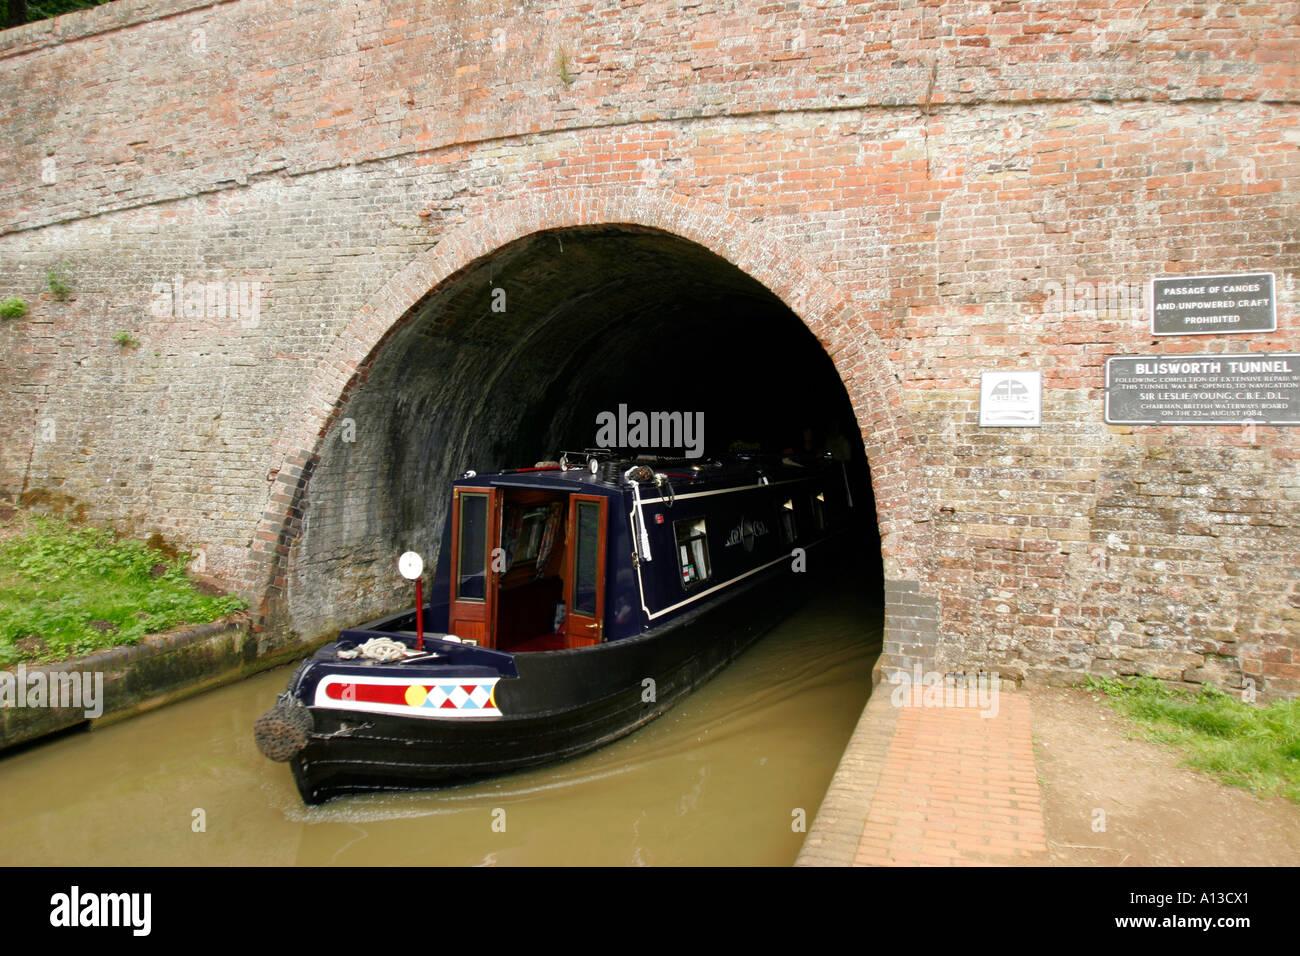 united kingdom Northamptonshire stoke bruerne blisworth tunnel on the grand union canal - Stock Image